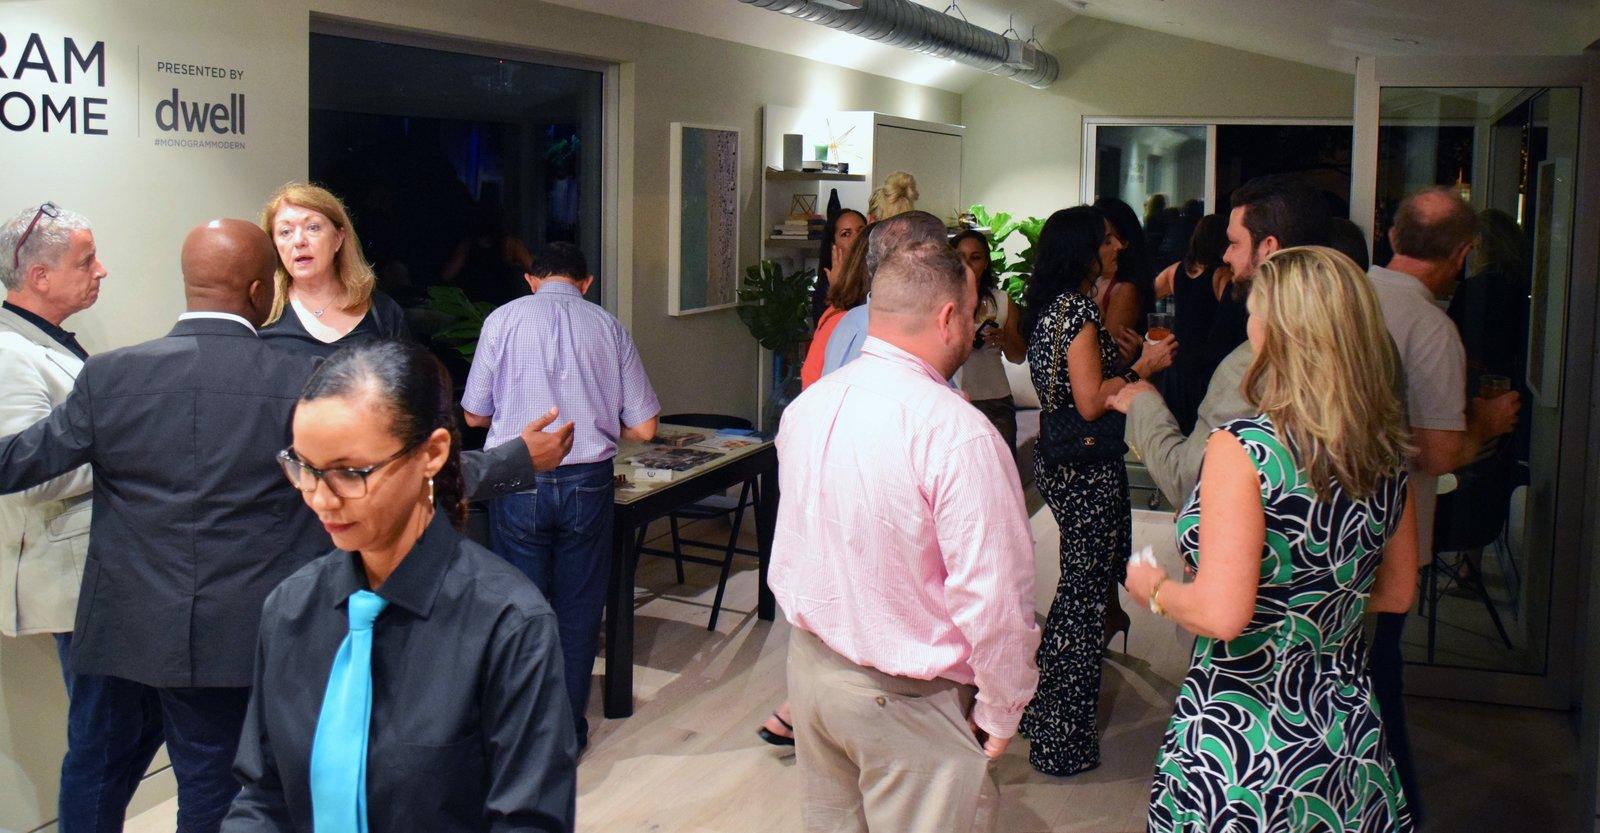 Photo 7 of 8 in Monogram Modern Home Lands at Miami Design Week